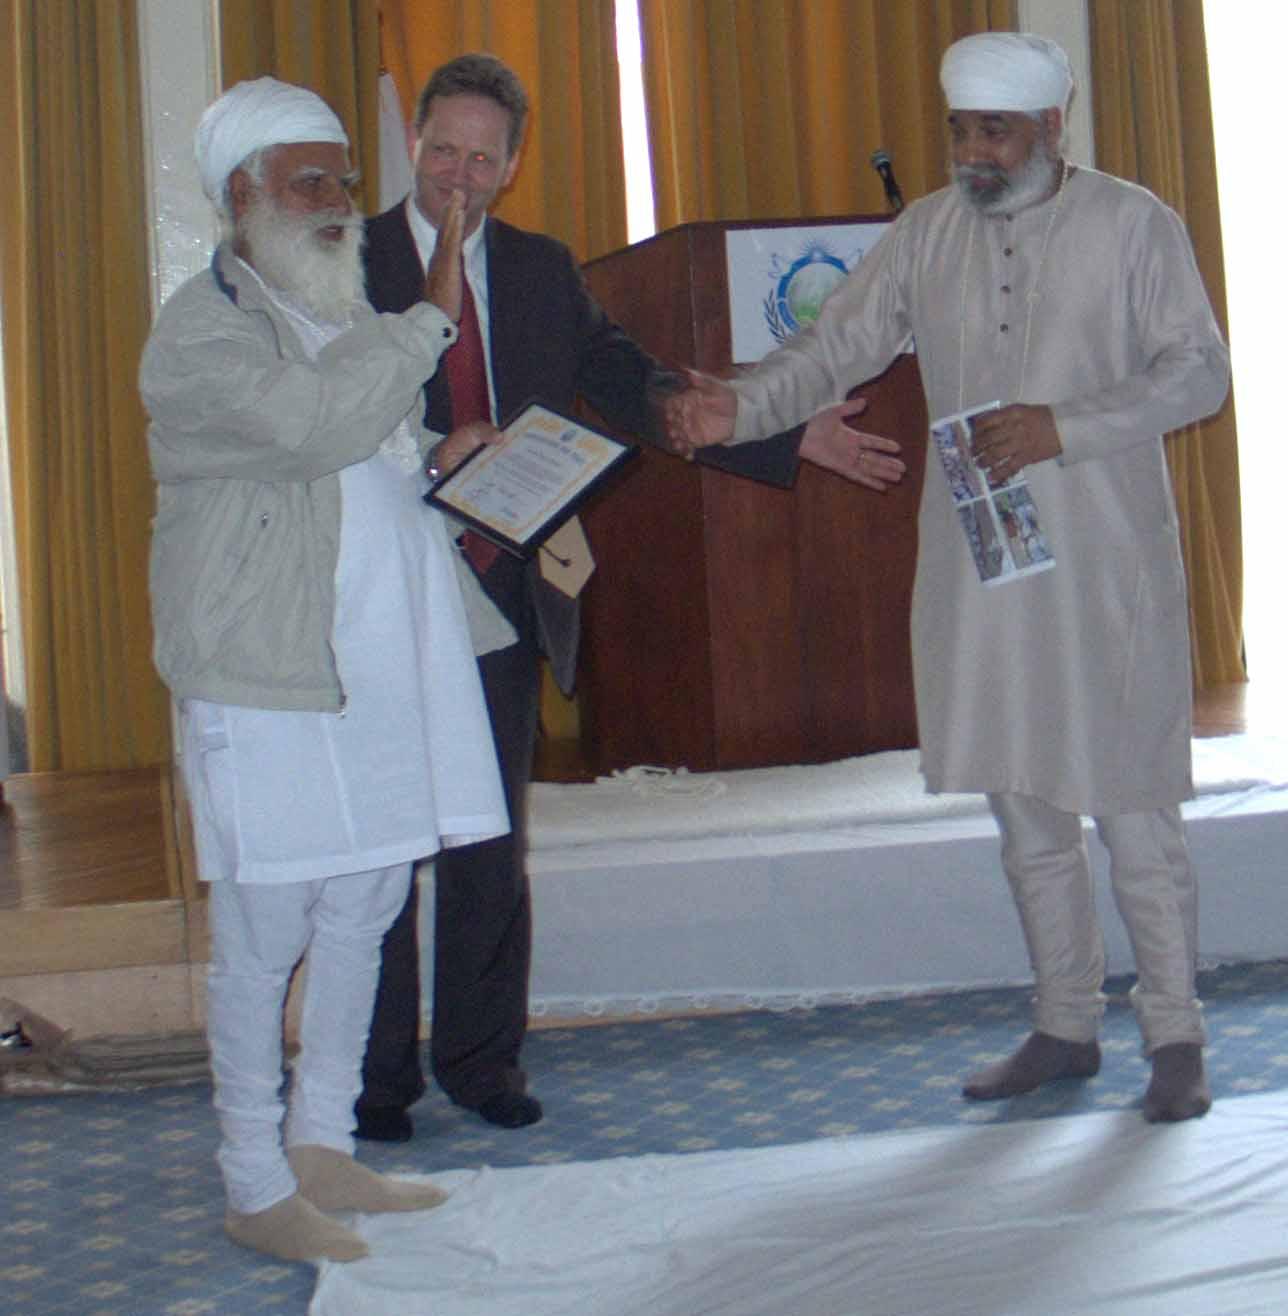 Ambassador for Peace Award - Prof. Tara Singh Anjan